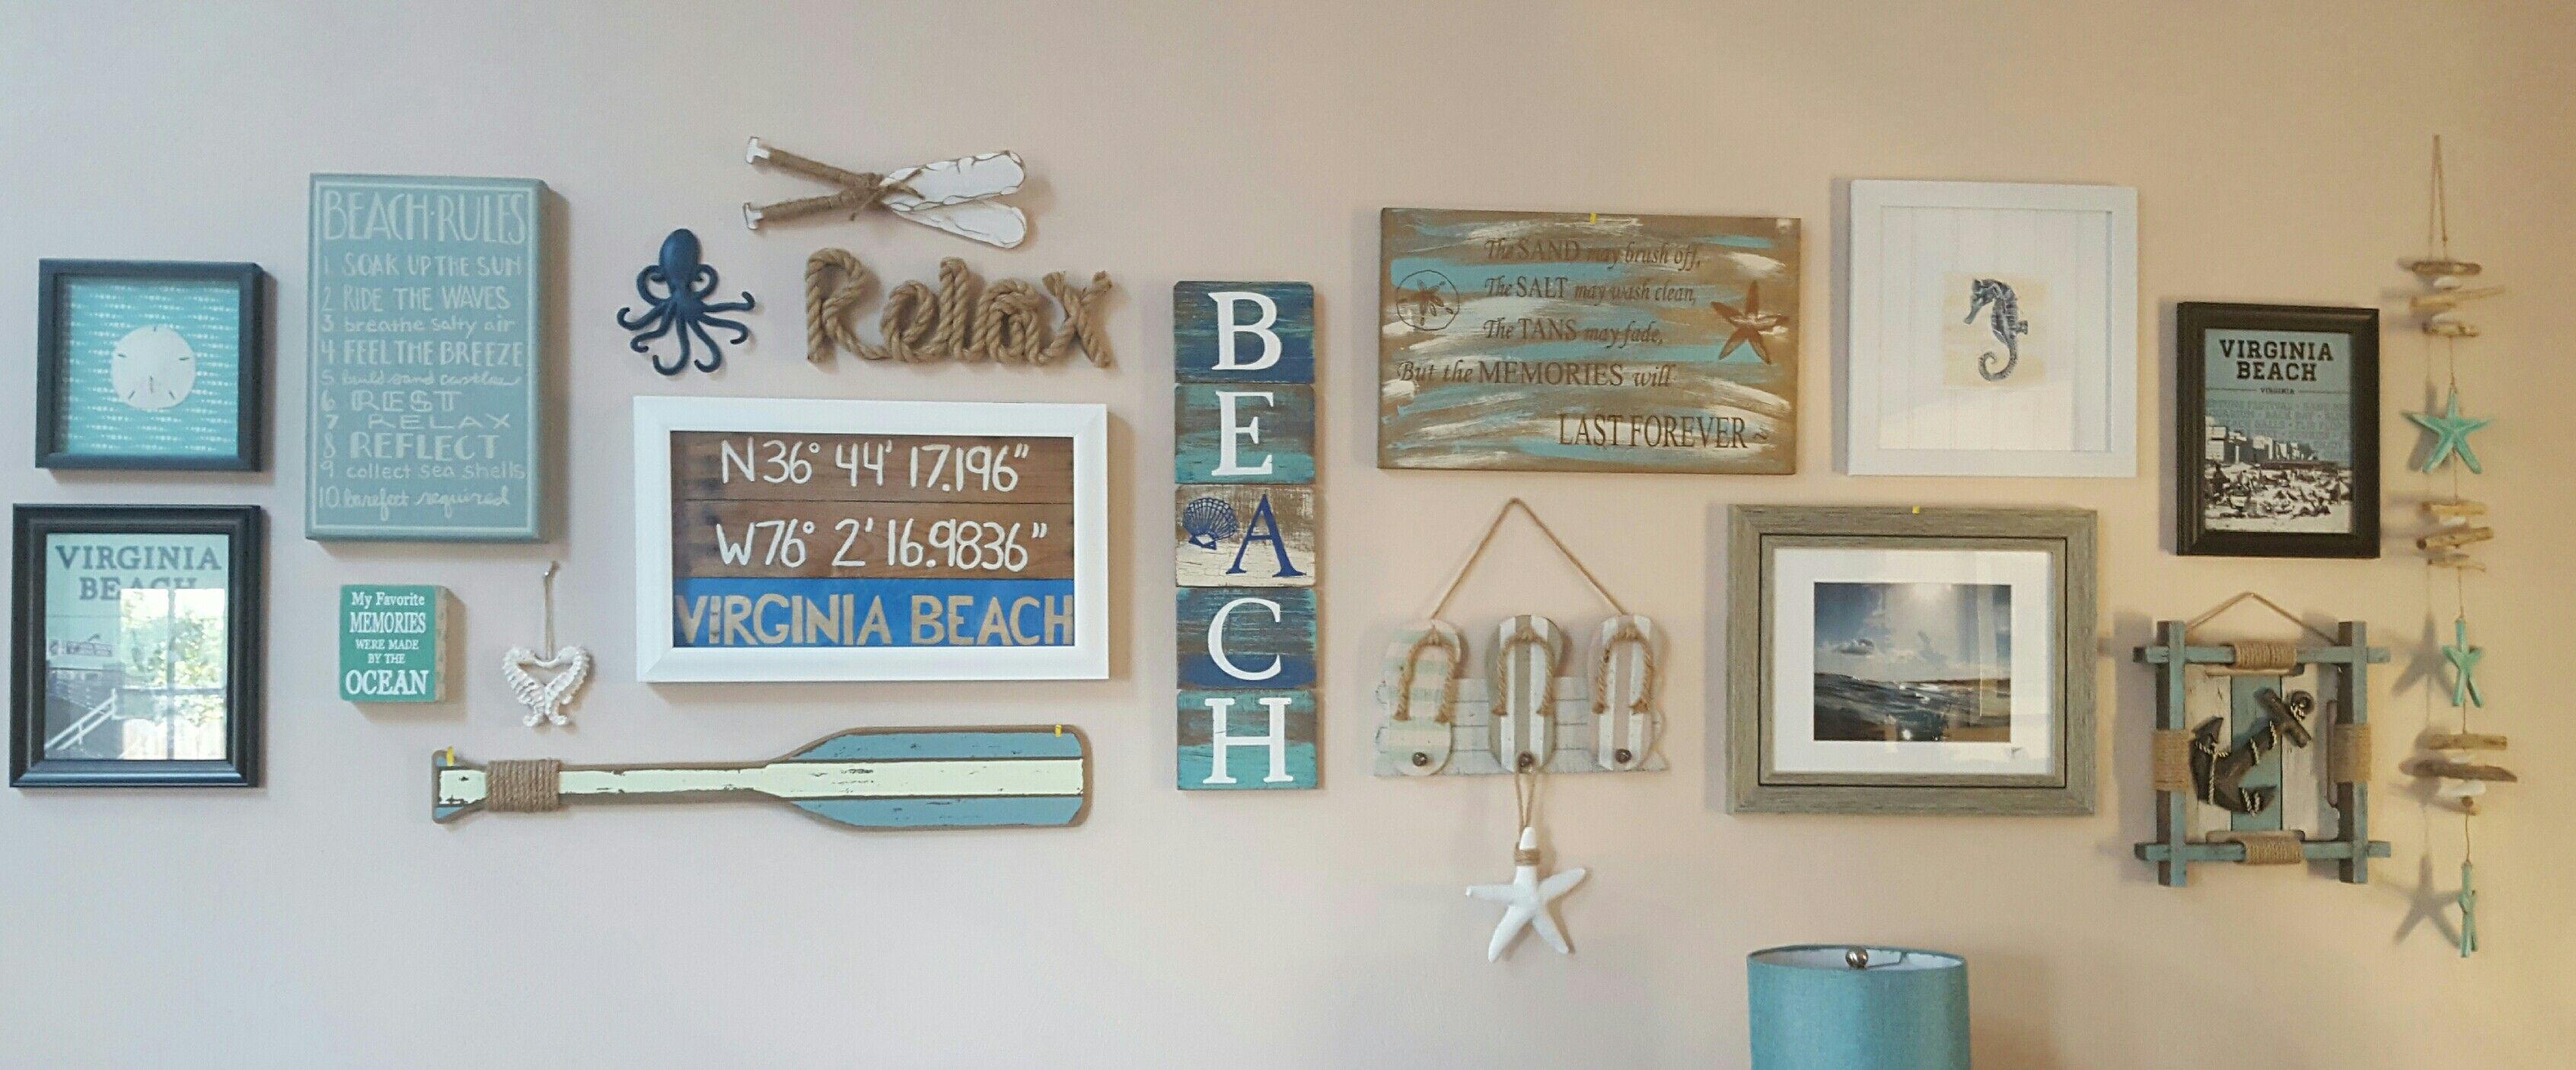 Liking My Coastal Themed Gallery Wall Gallery Wall Beach Theme Wall Decor Coastal Gallery Wall